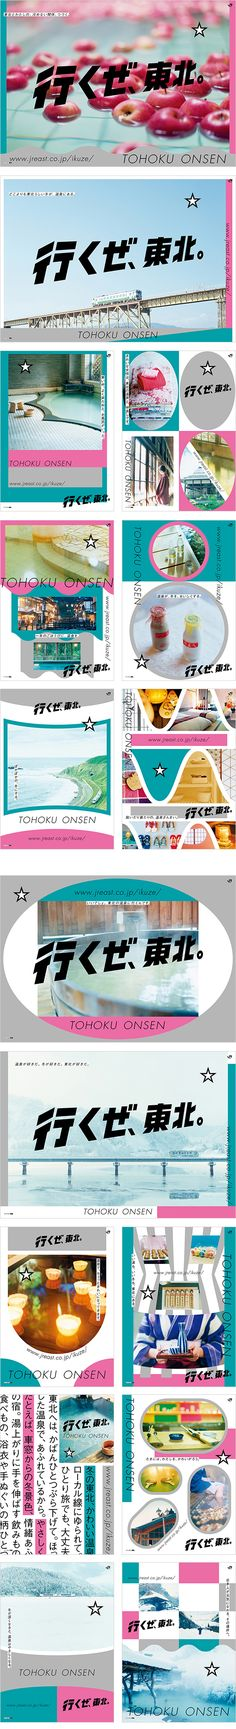 JR東日本:行くぜ、東北。2012 冬 Ad Layout, Print Layout, Book Layout, Layout Design, Web Design, Japan Design, Flyer Design, Japanese Poster